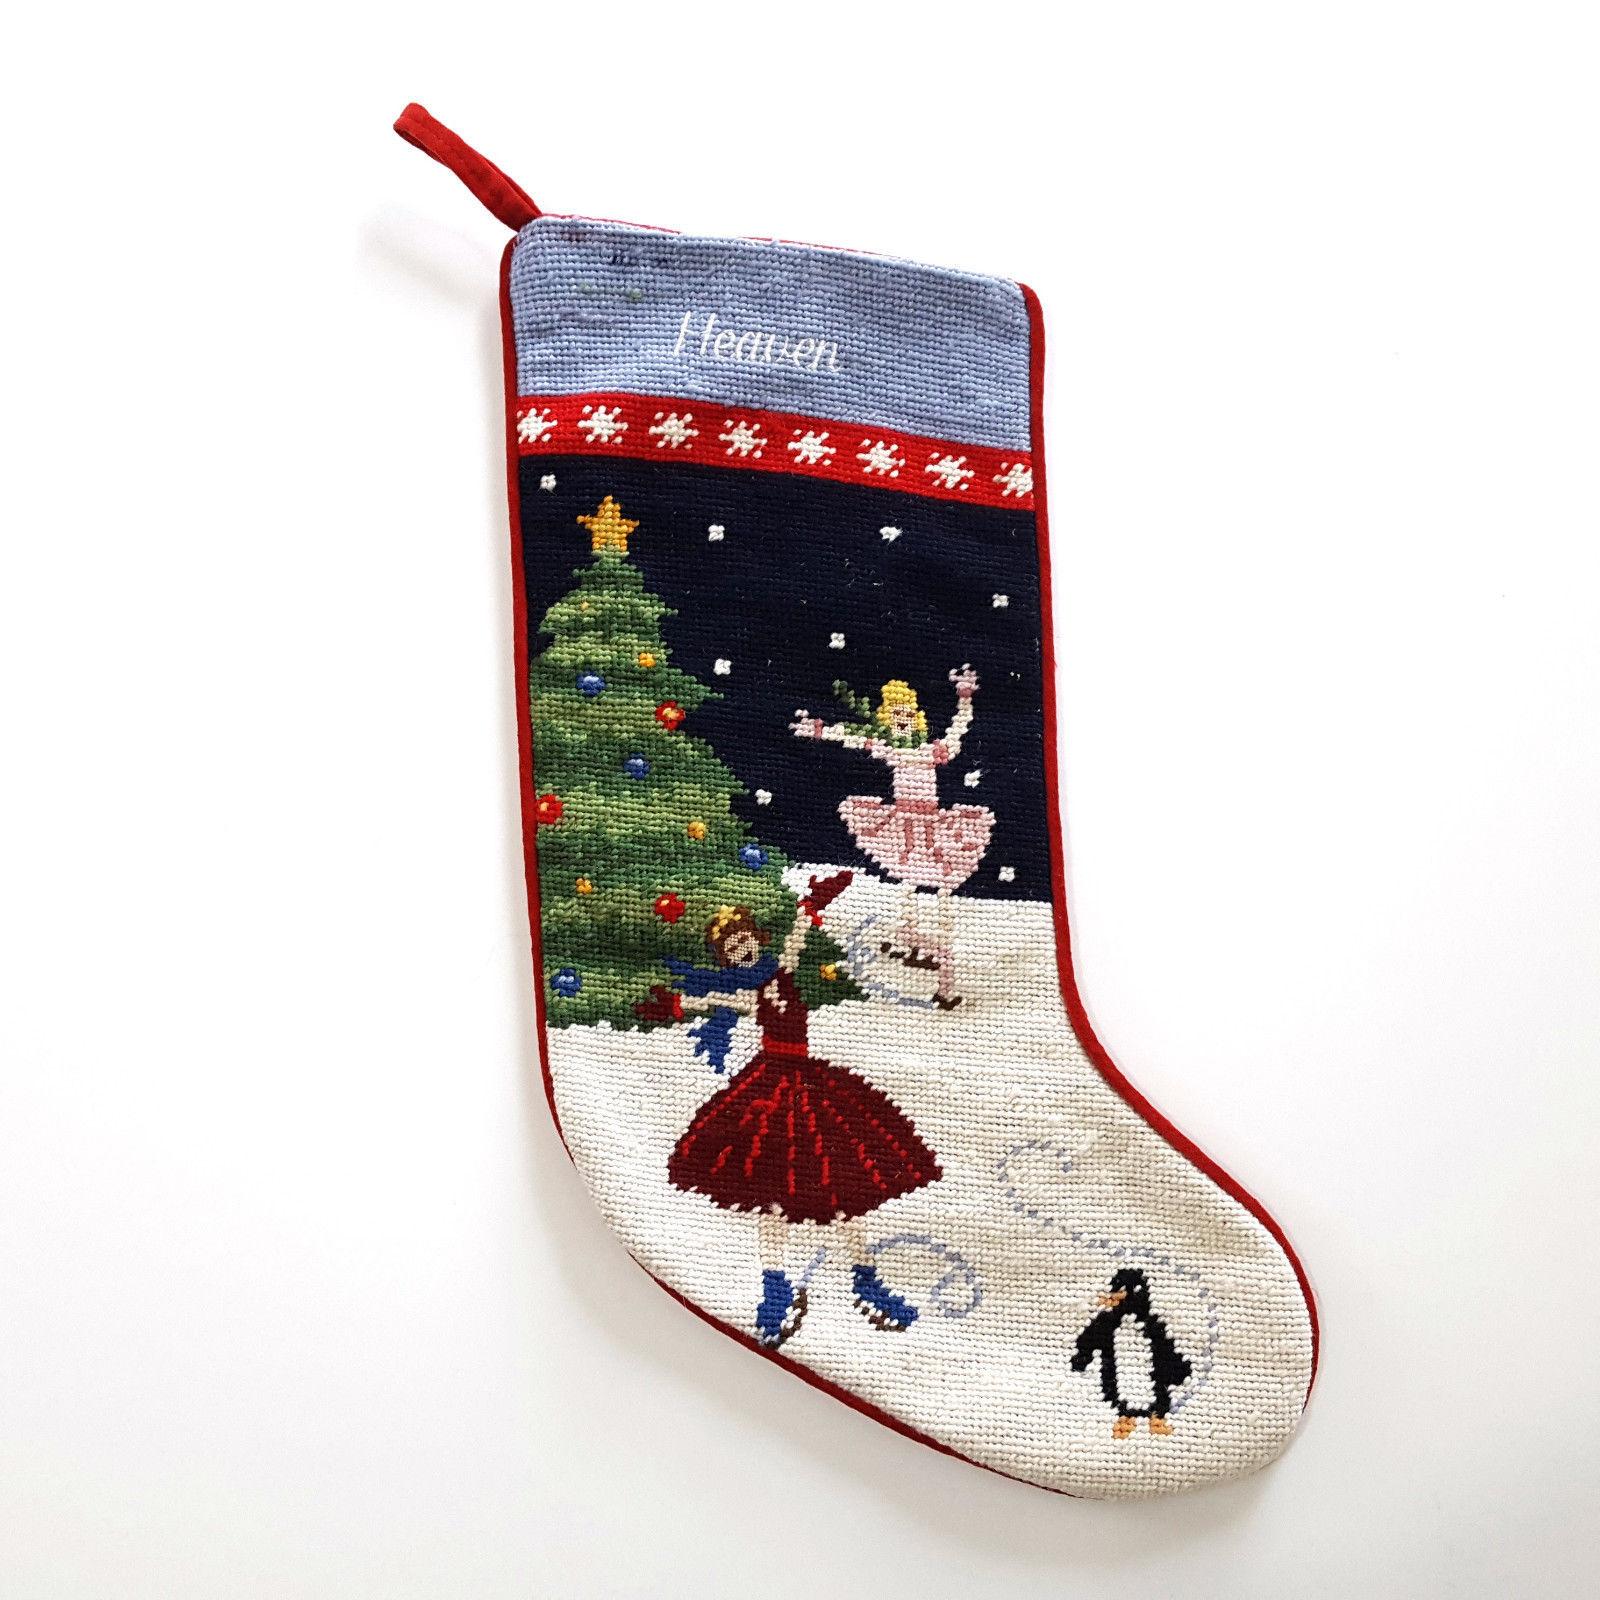 Lands End Needlepoint Christmas Stocking and similar items